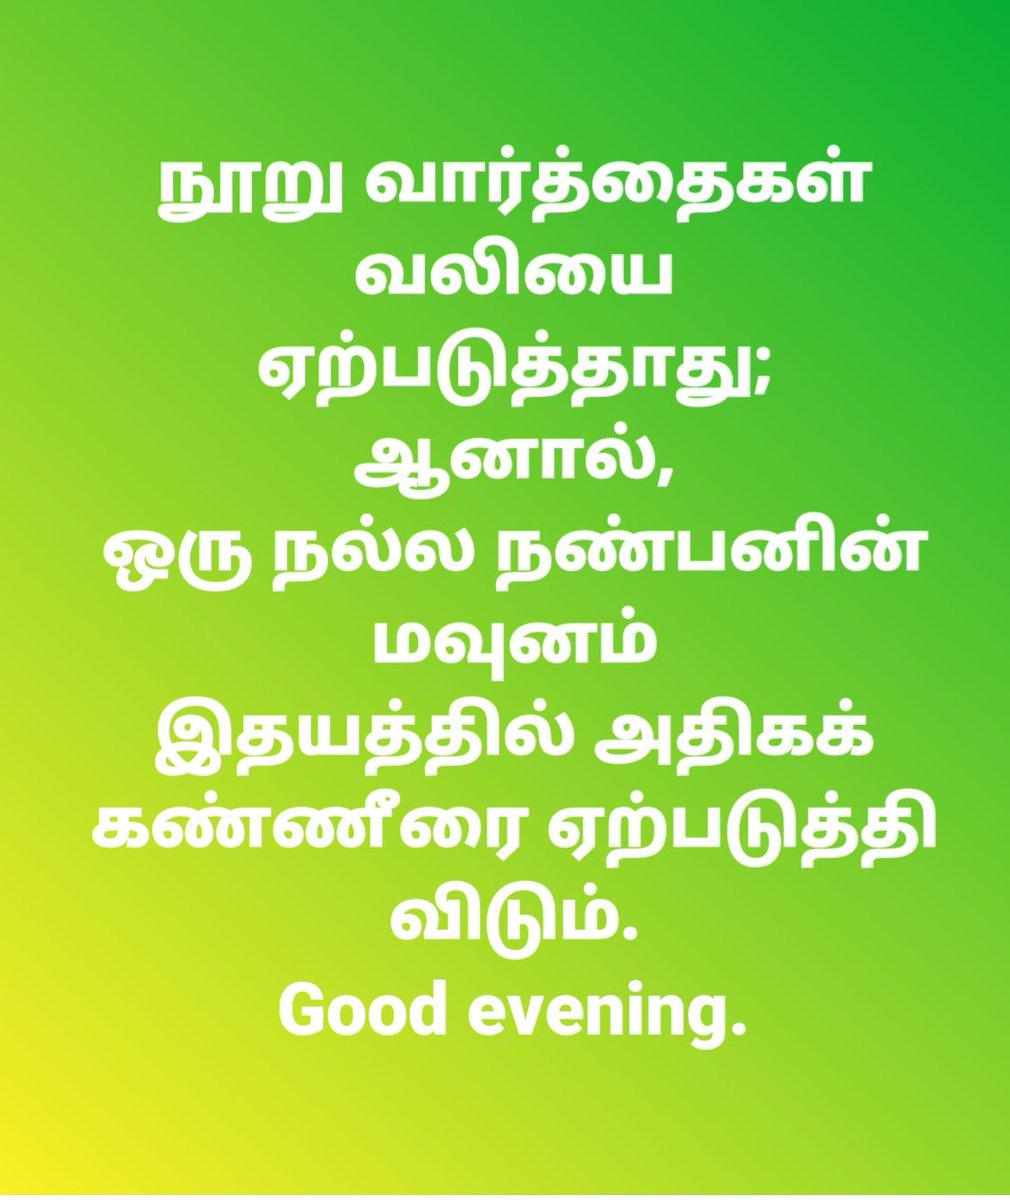 Besttamilquotes On Twitter Good Evening To All Tamilquotes